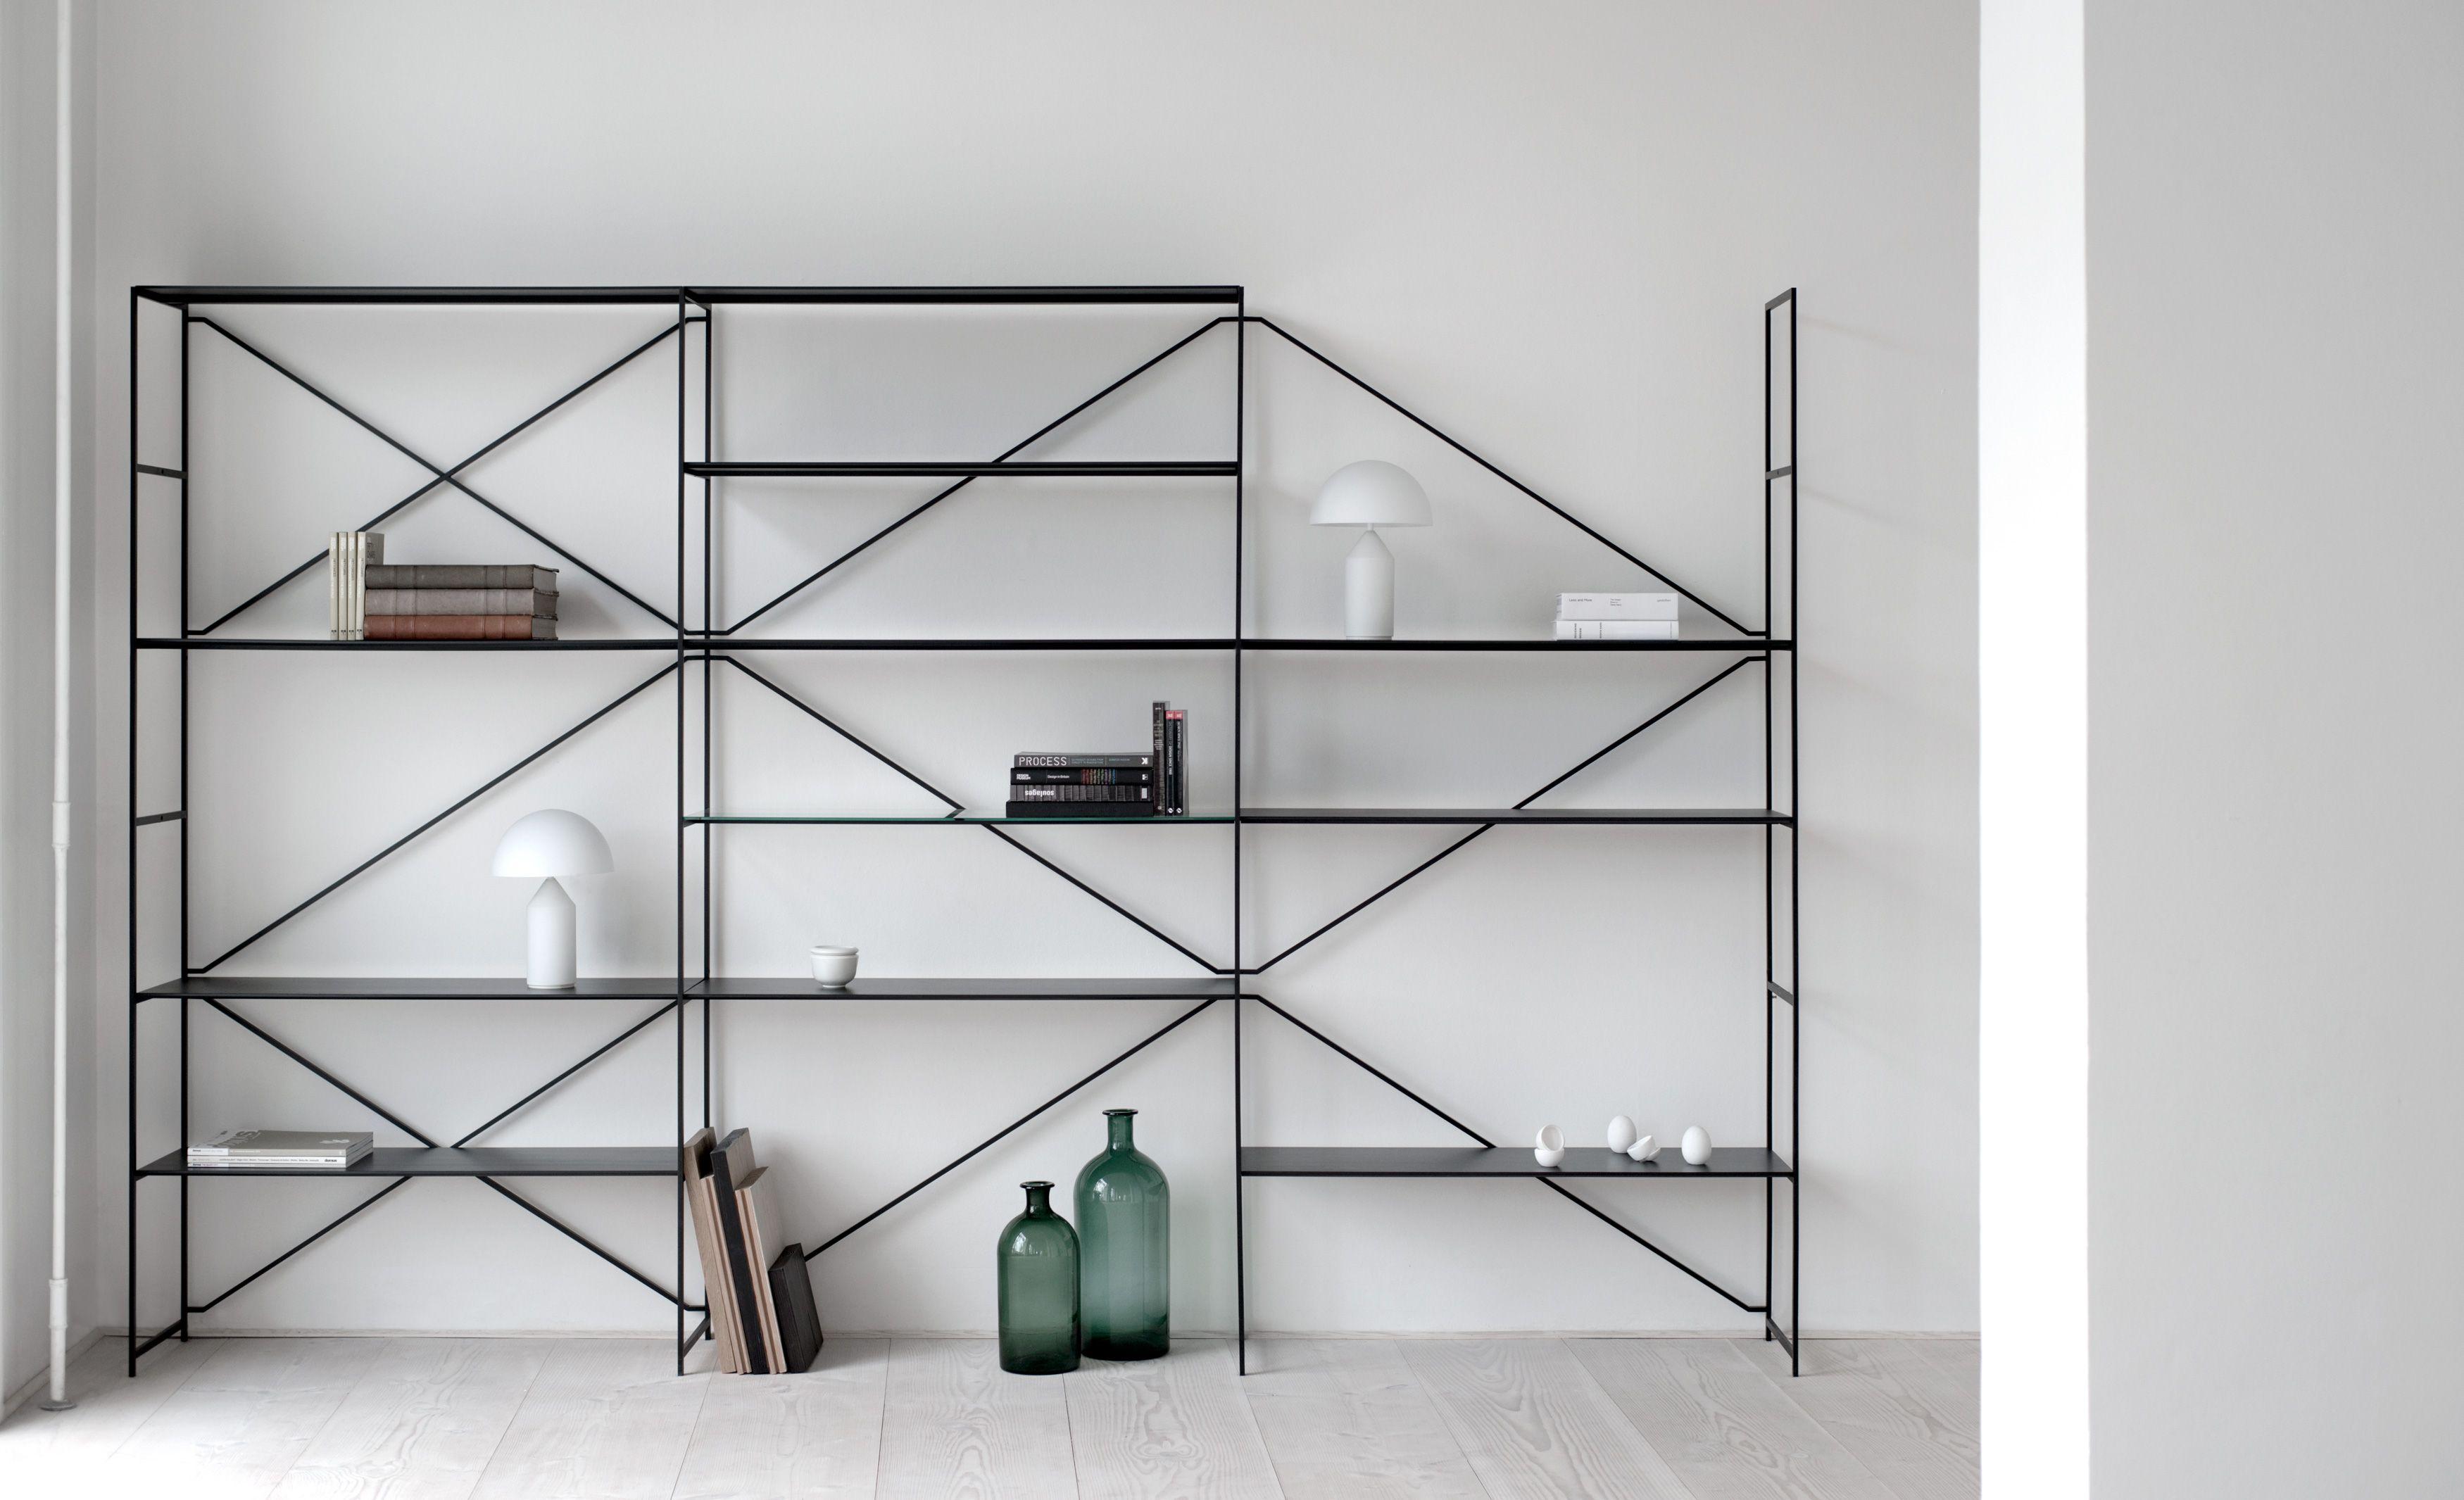 Scaffali Ufficio Design : R.i.g. modules by ma u studio 2014. design by mikal harrsen & adam